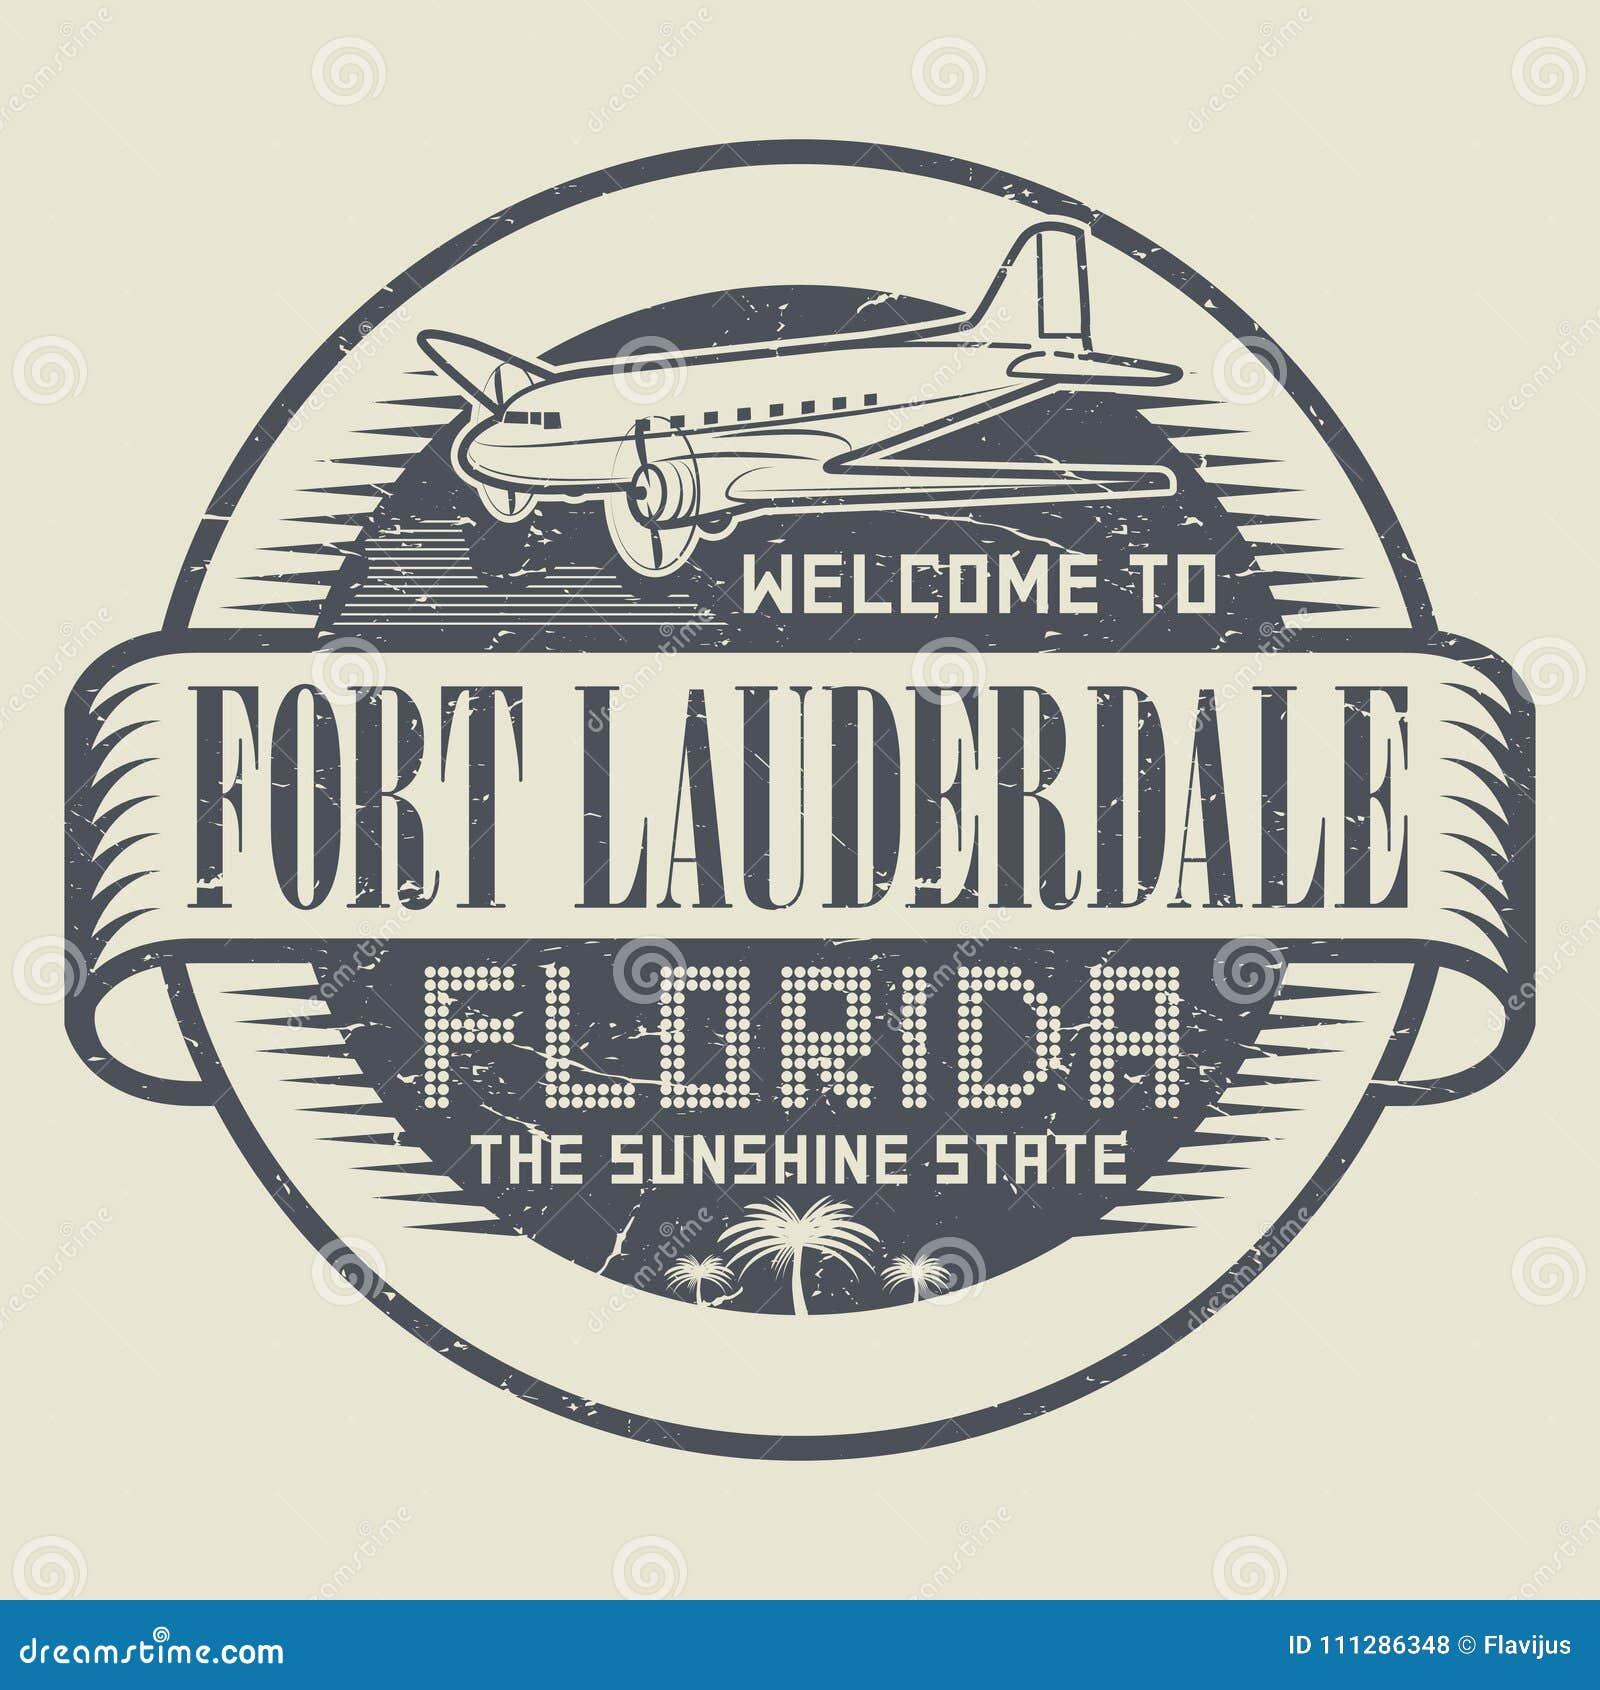 Selo com boa vinda ao Fort Lauderdale, Florida do texto